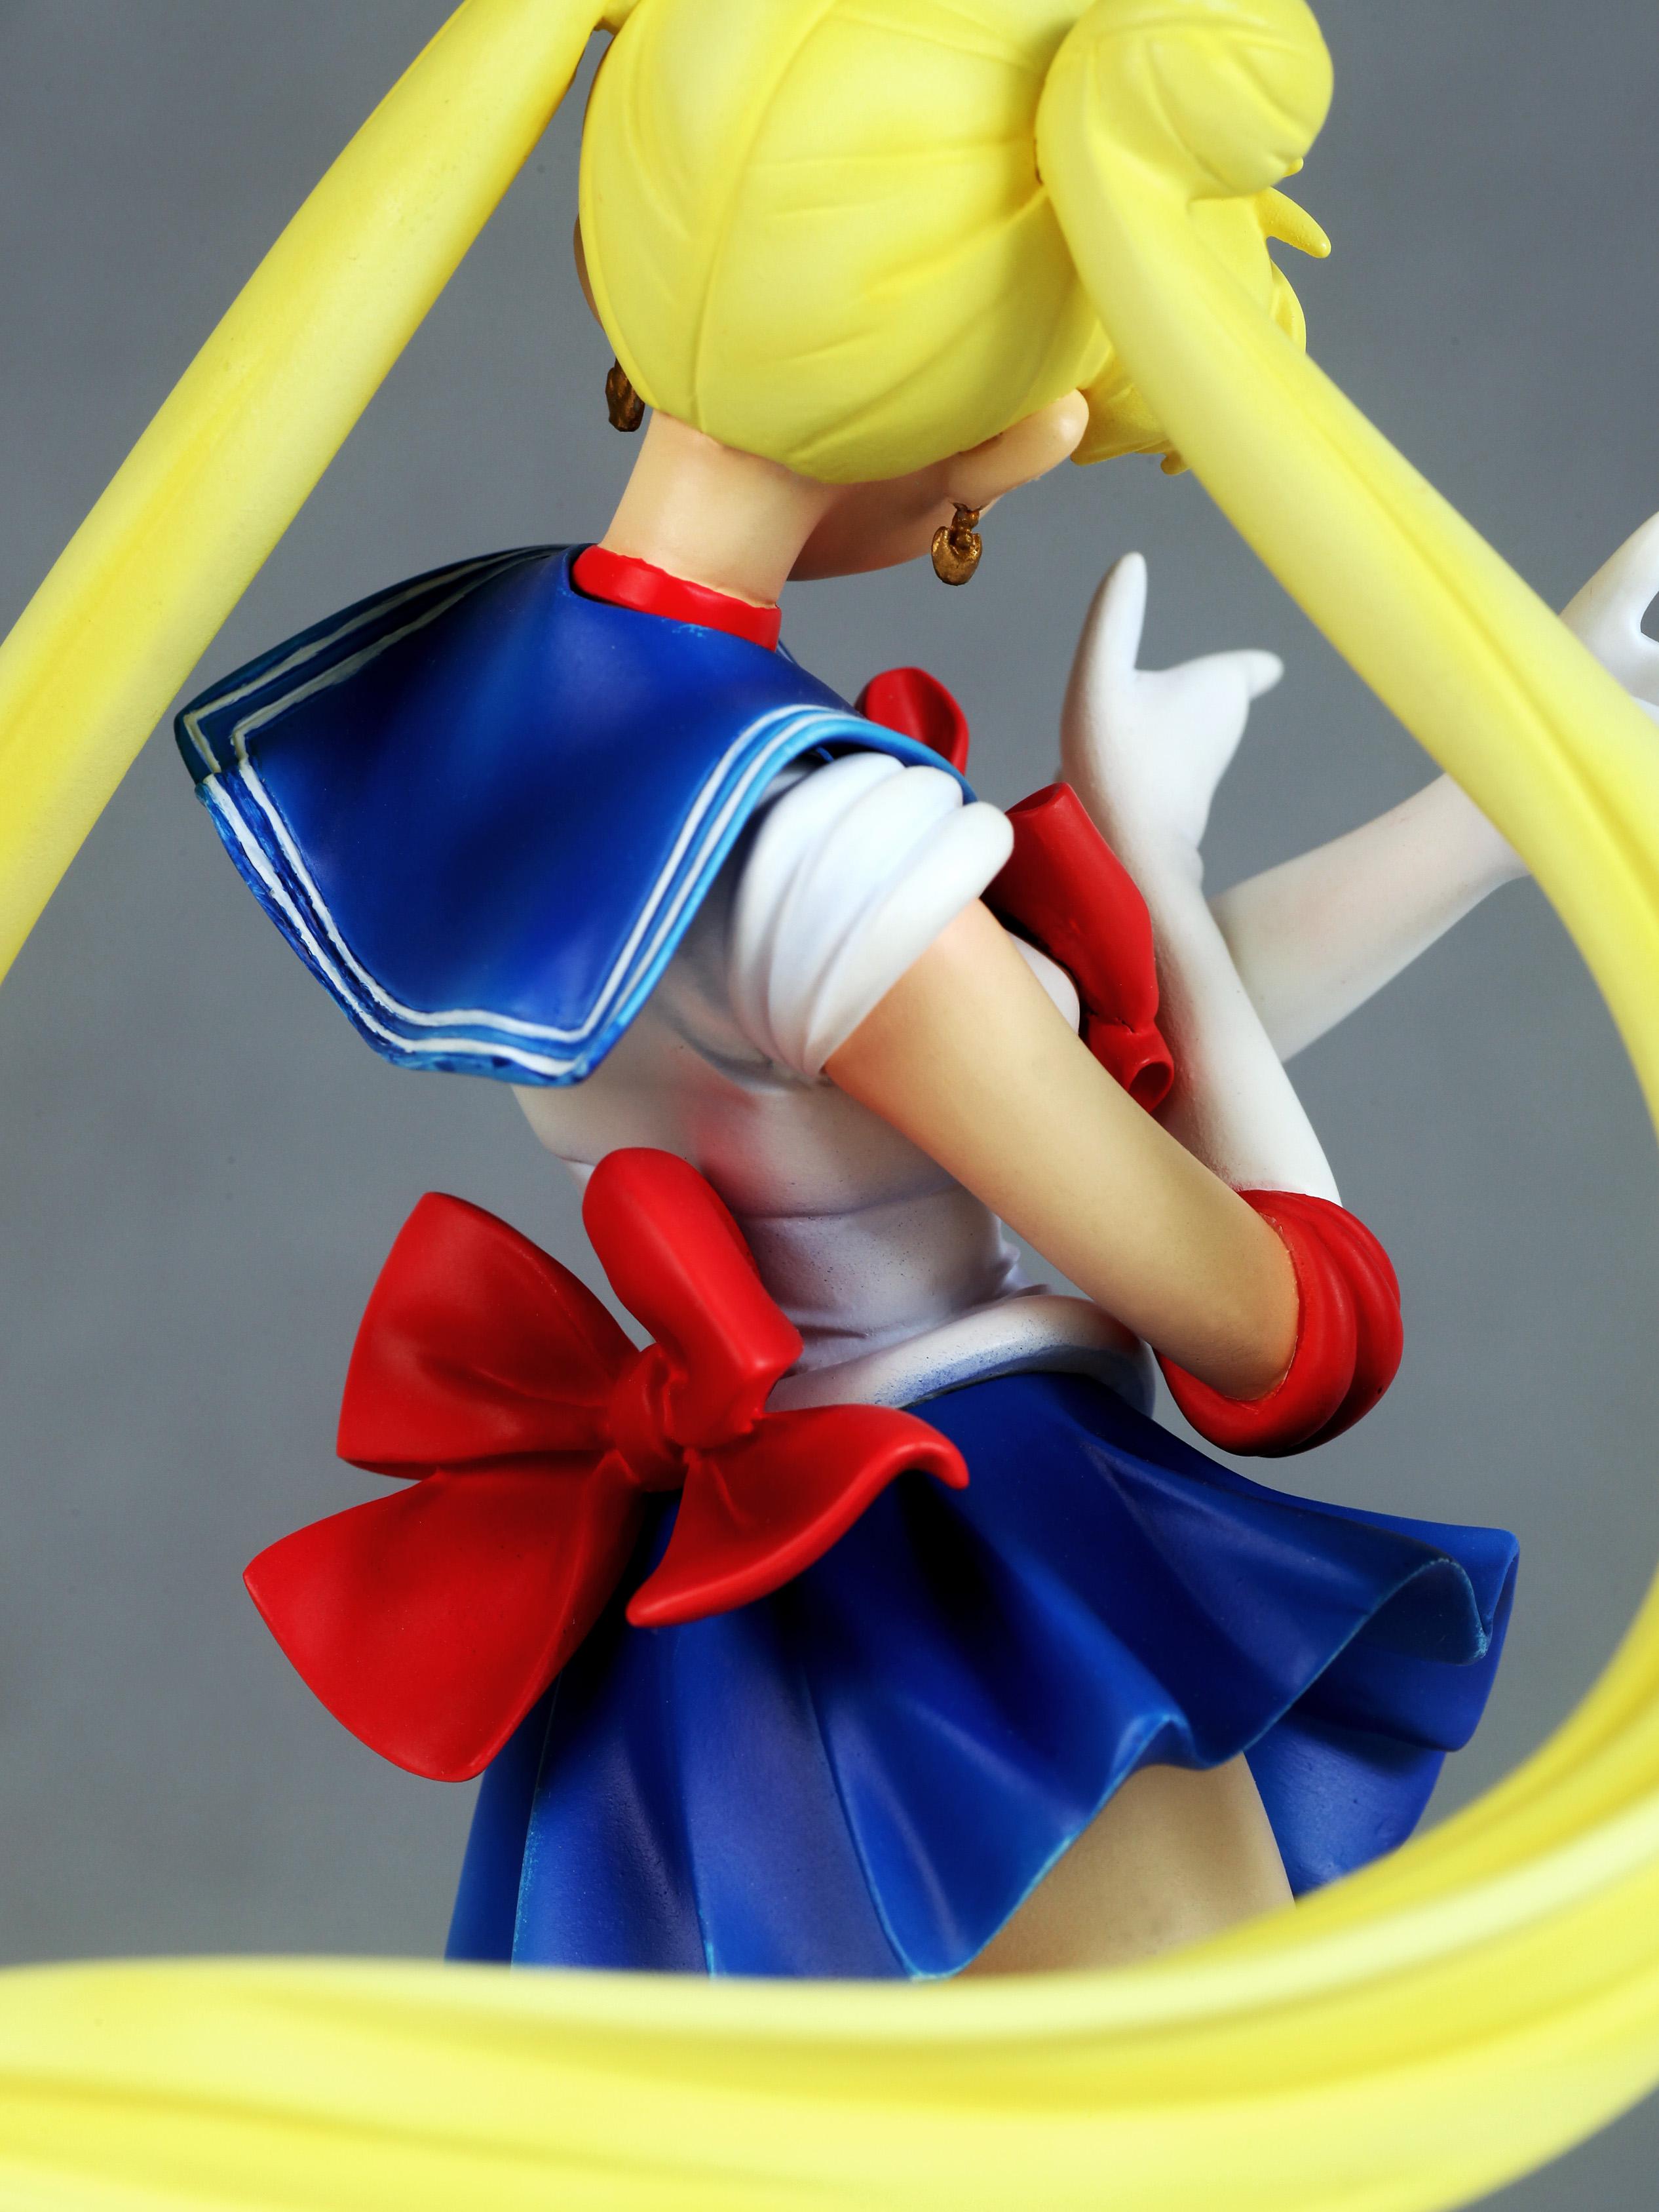 Sailor Moon Usagi Tsukino prepainted figure haruhichan.com Sailor Moon Anime figure 10